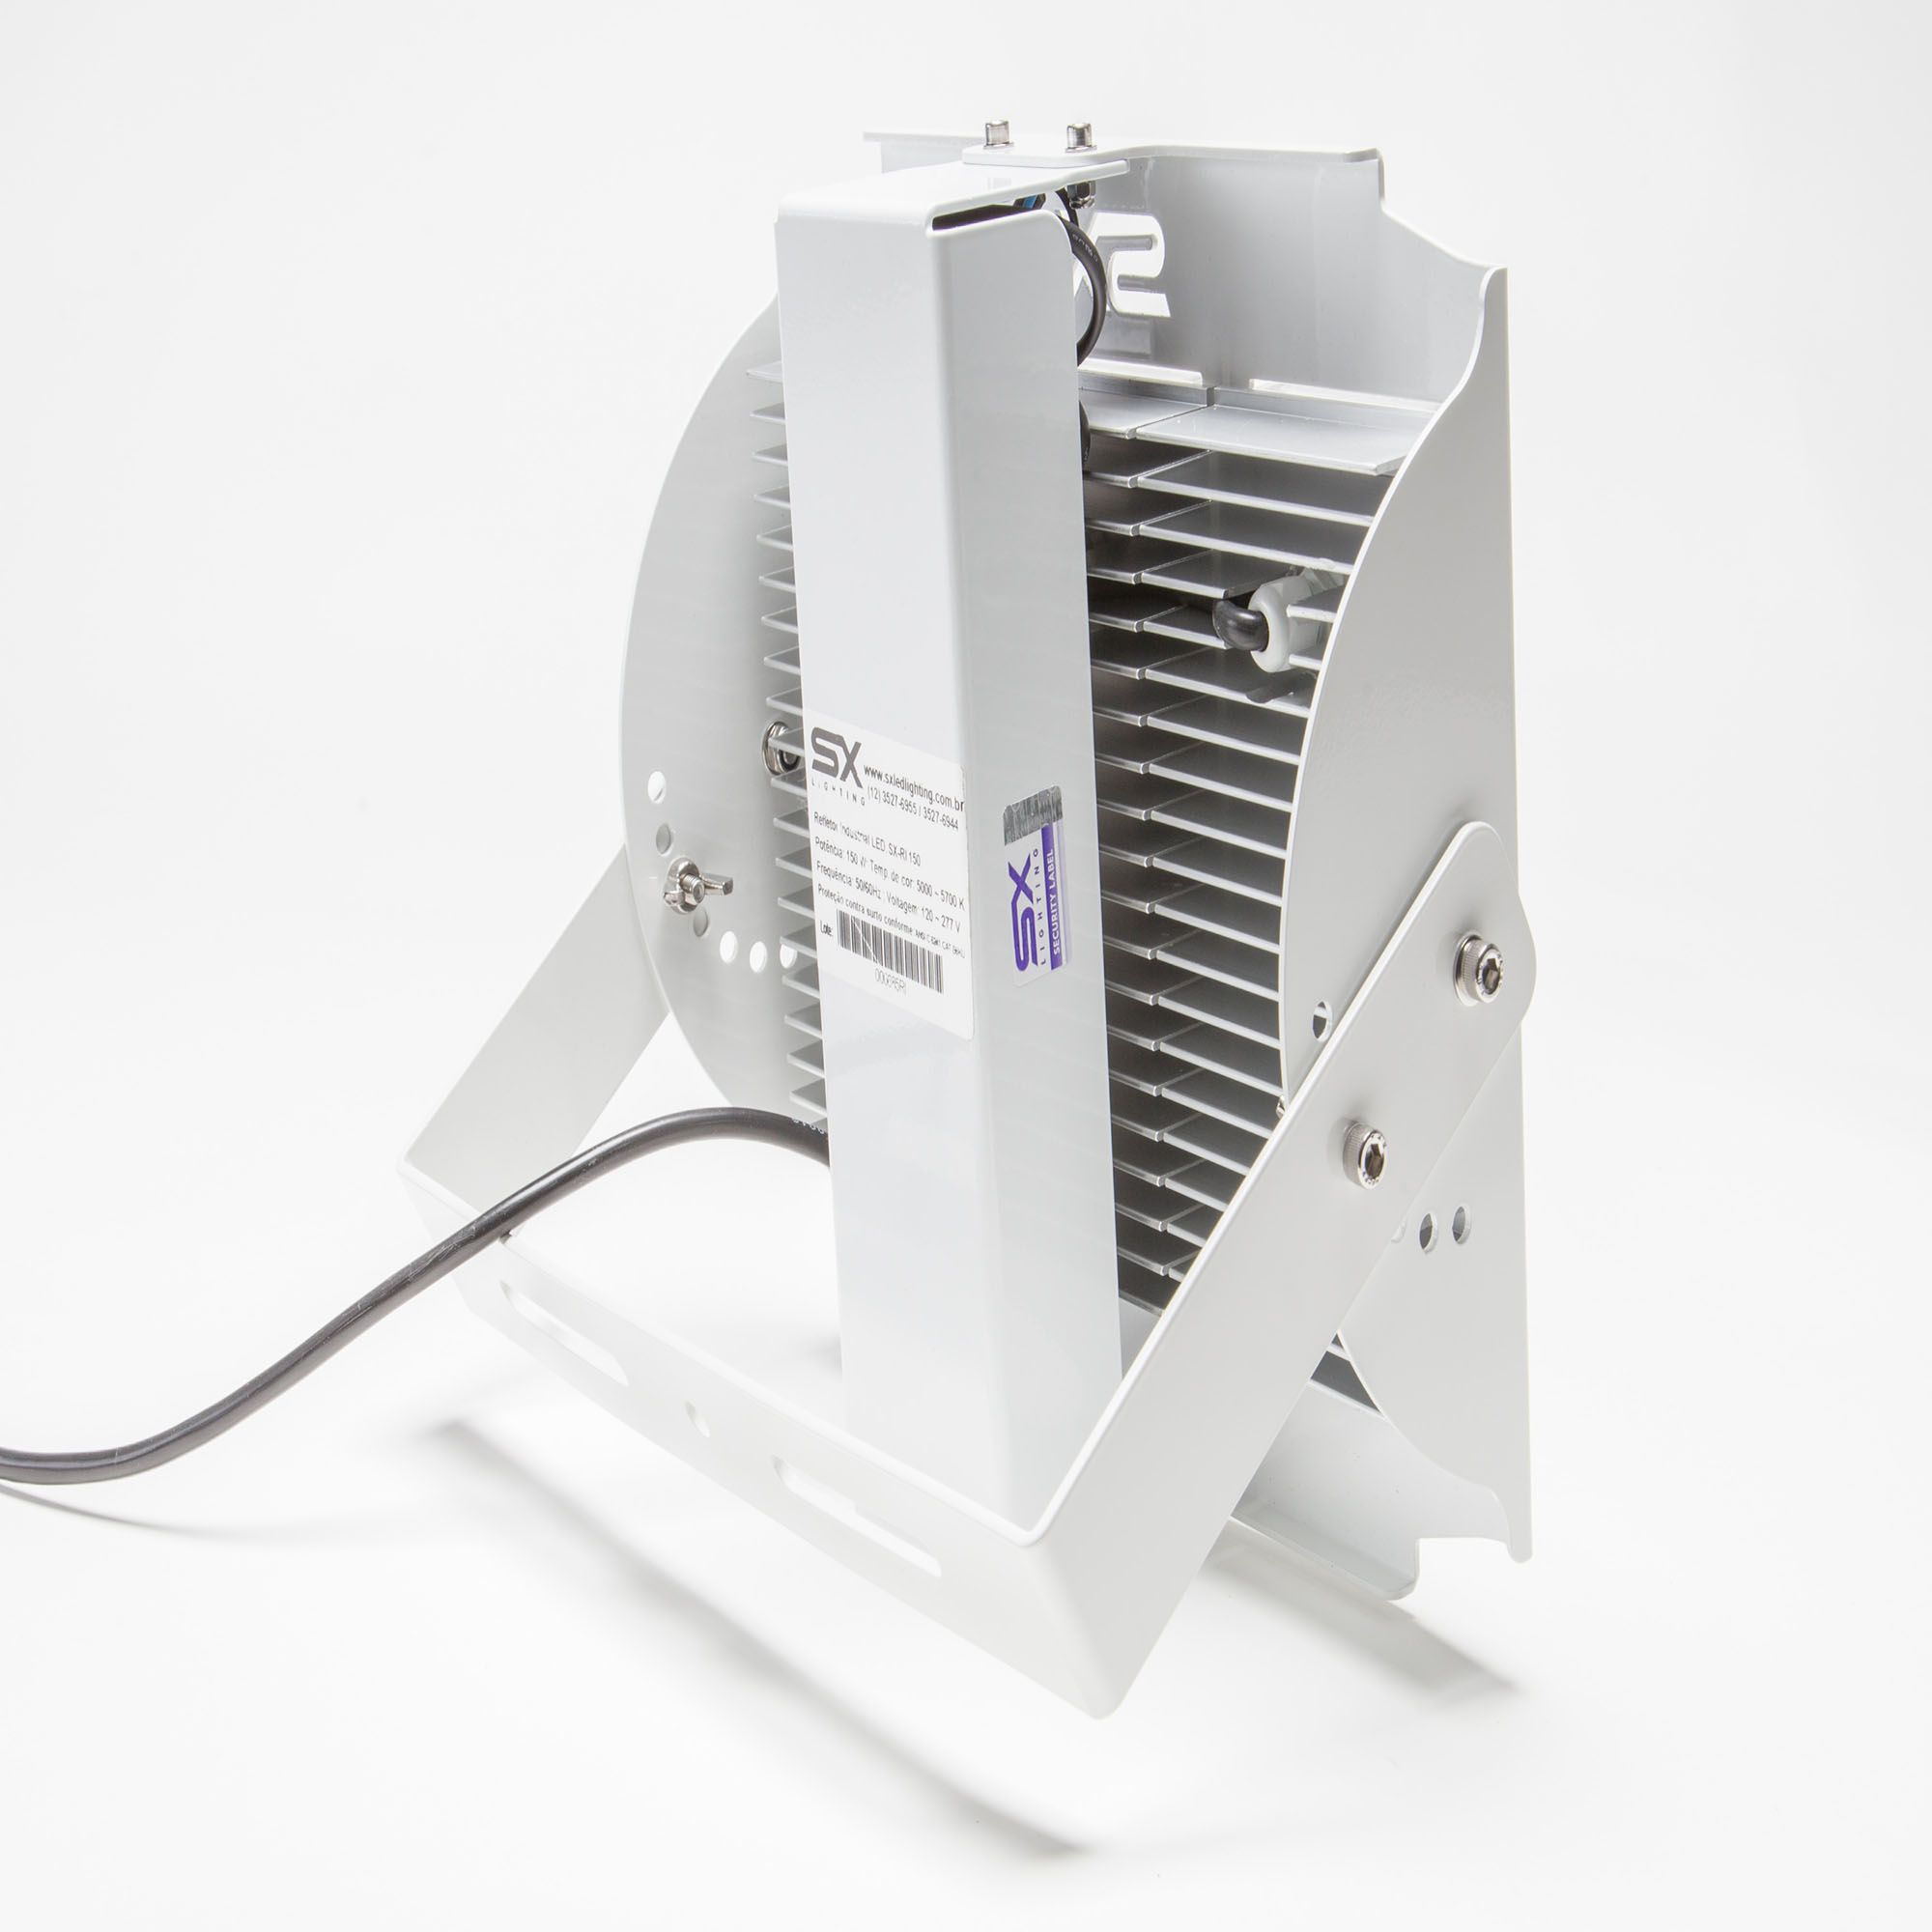 Refletor Industrial Smart SX LED 105W  - RJE ILUMINAÇÃO